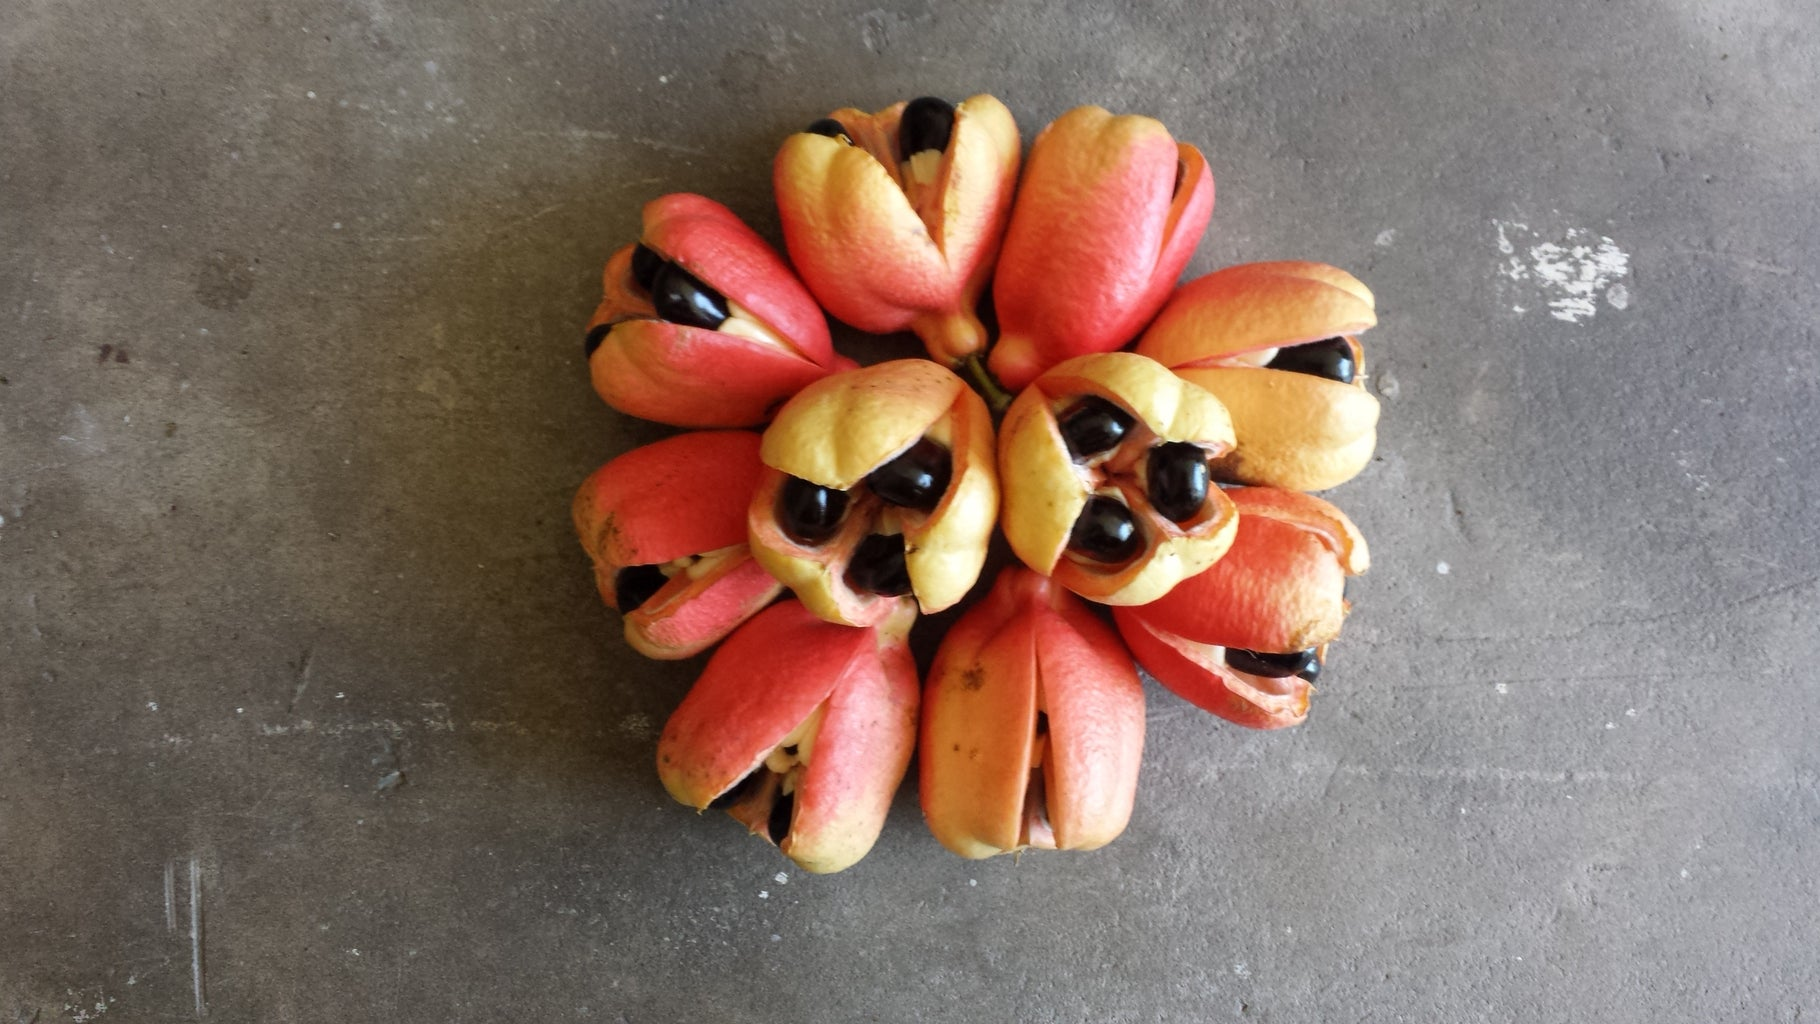 Removing Fruit